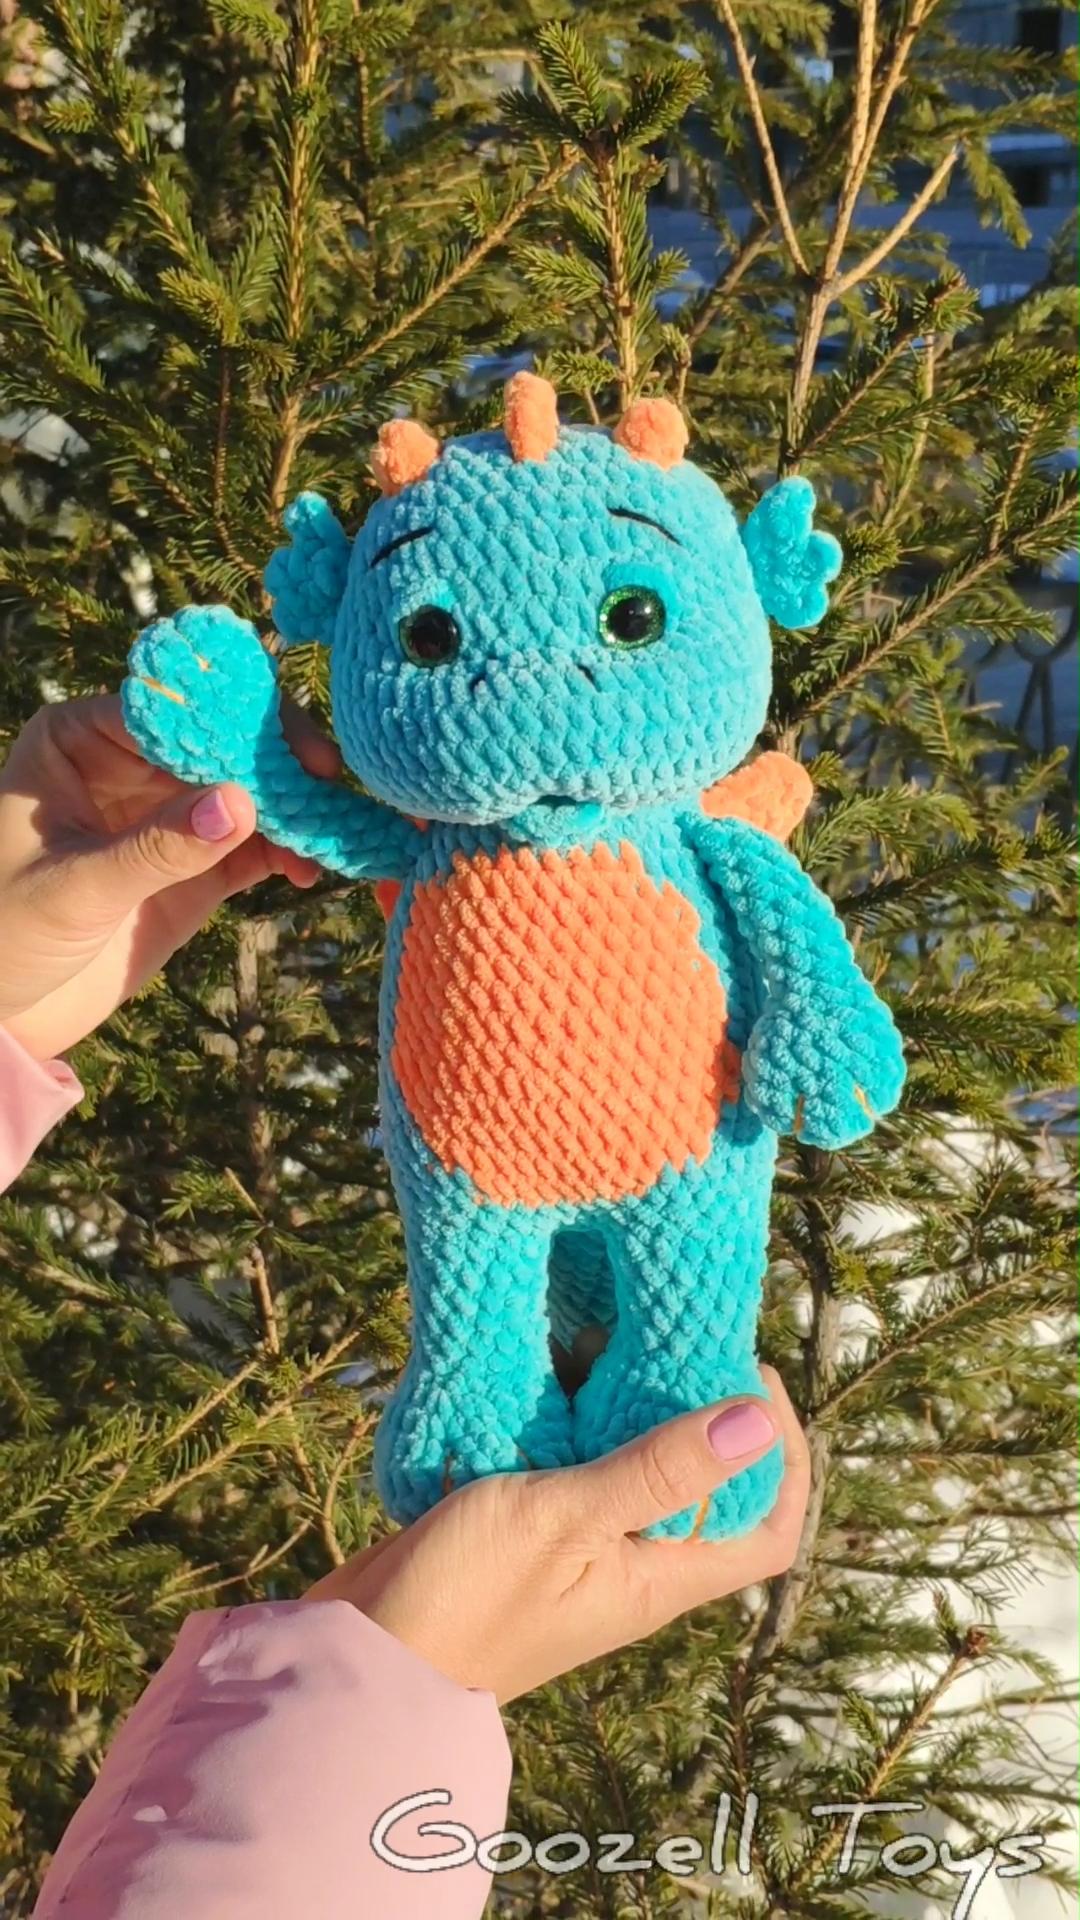 Photo of CROCHET DRAGON PATTERN, Amigurumi Drachenmuster, Crochet Dinosaur Muster, Stuff Drachenspielzeug Muster